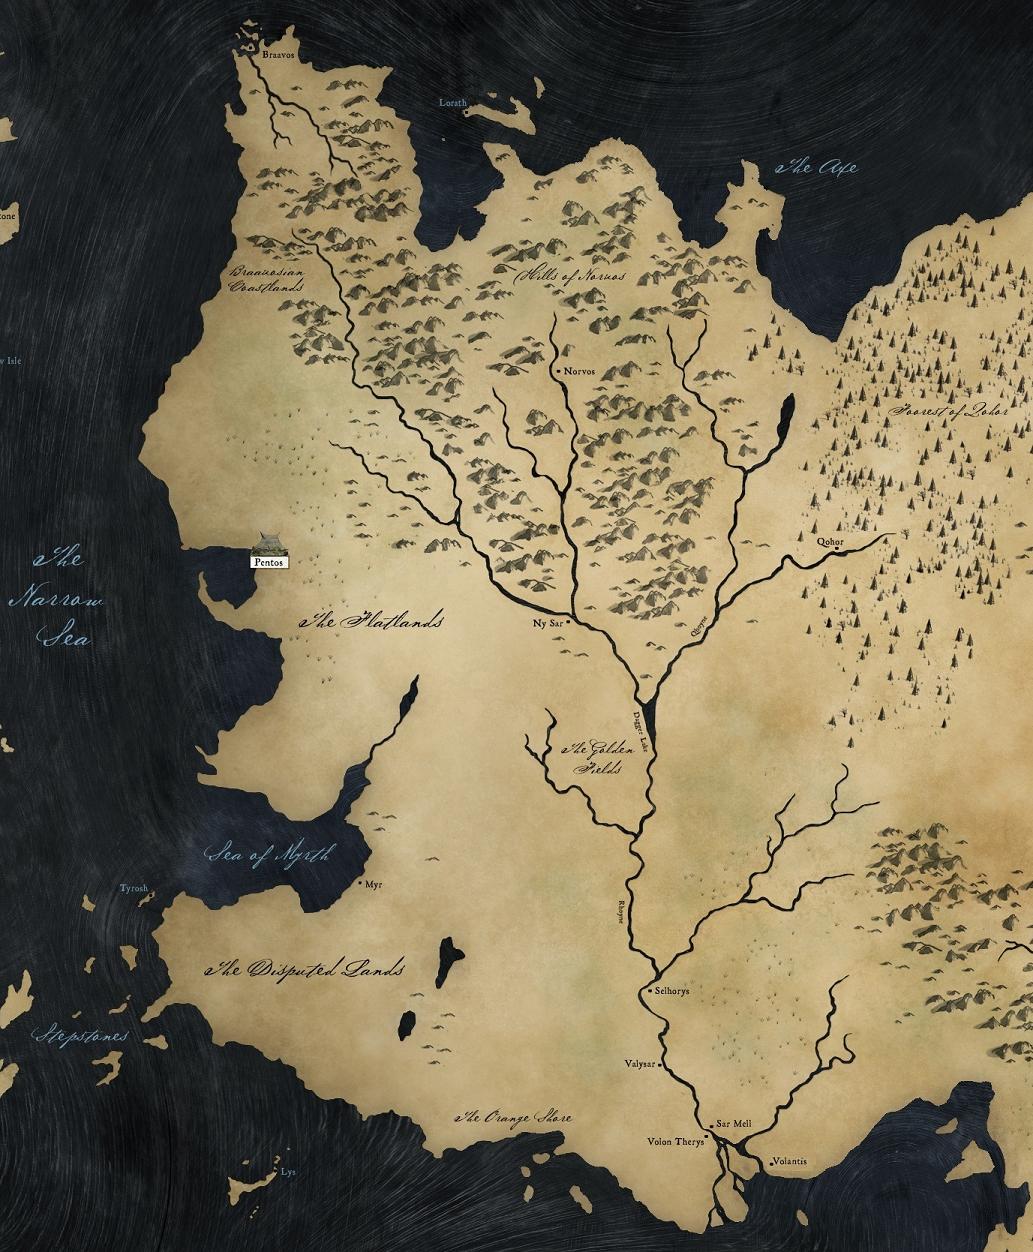 Karte Westeros Essos Deutsch.Essos Game Of Thrones Wiki Fandom Powered By Wikia